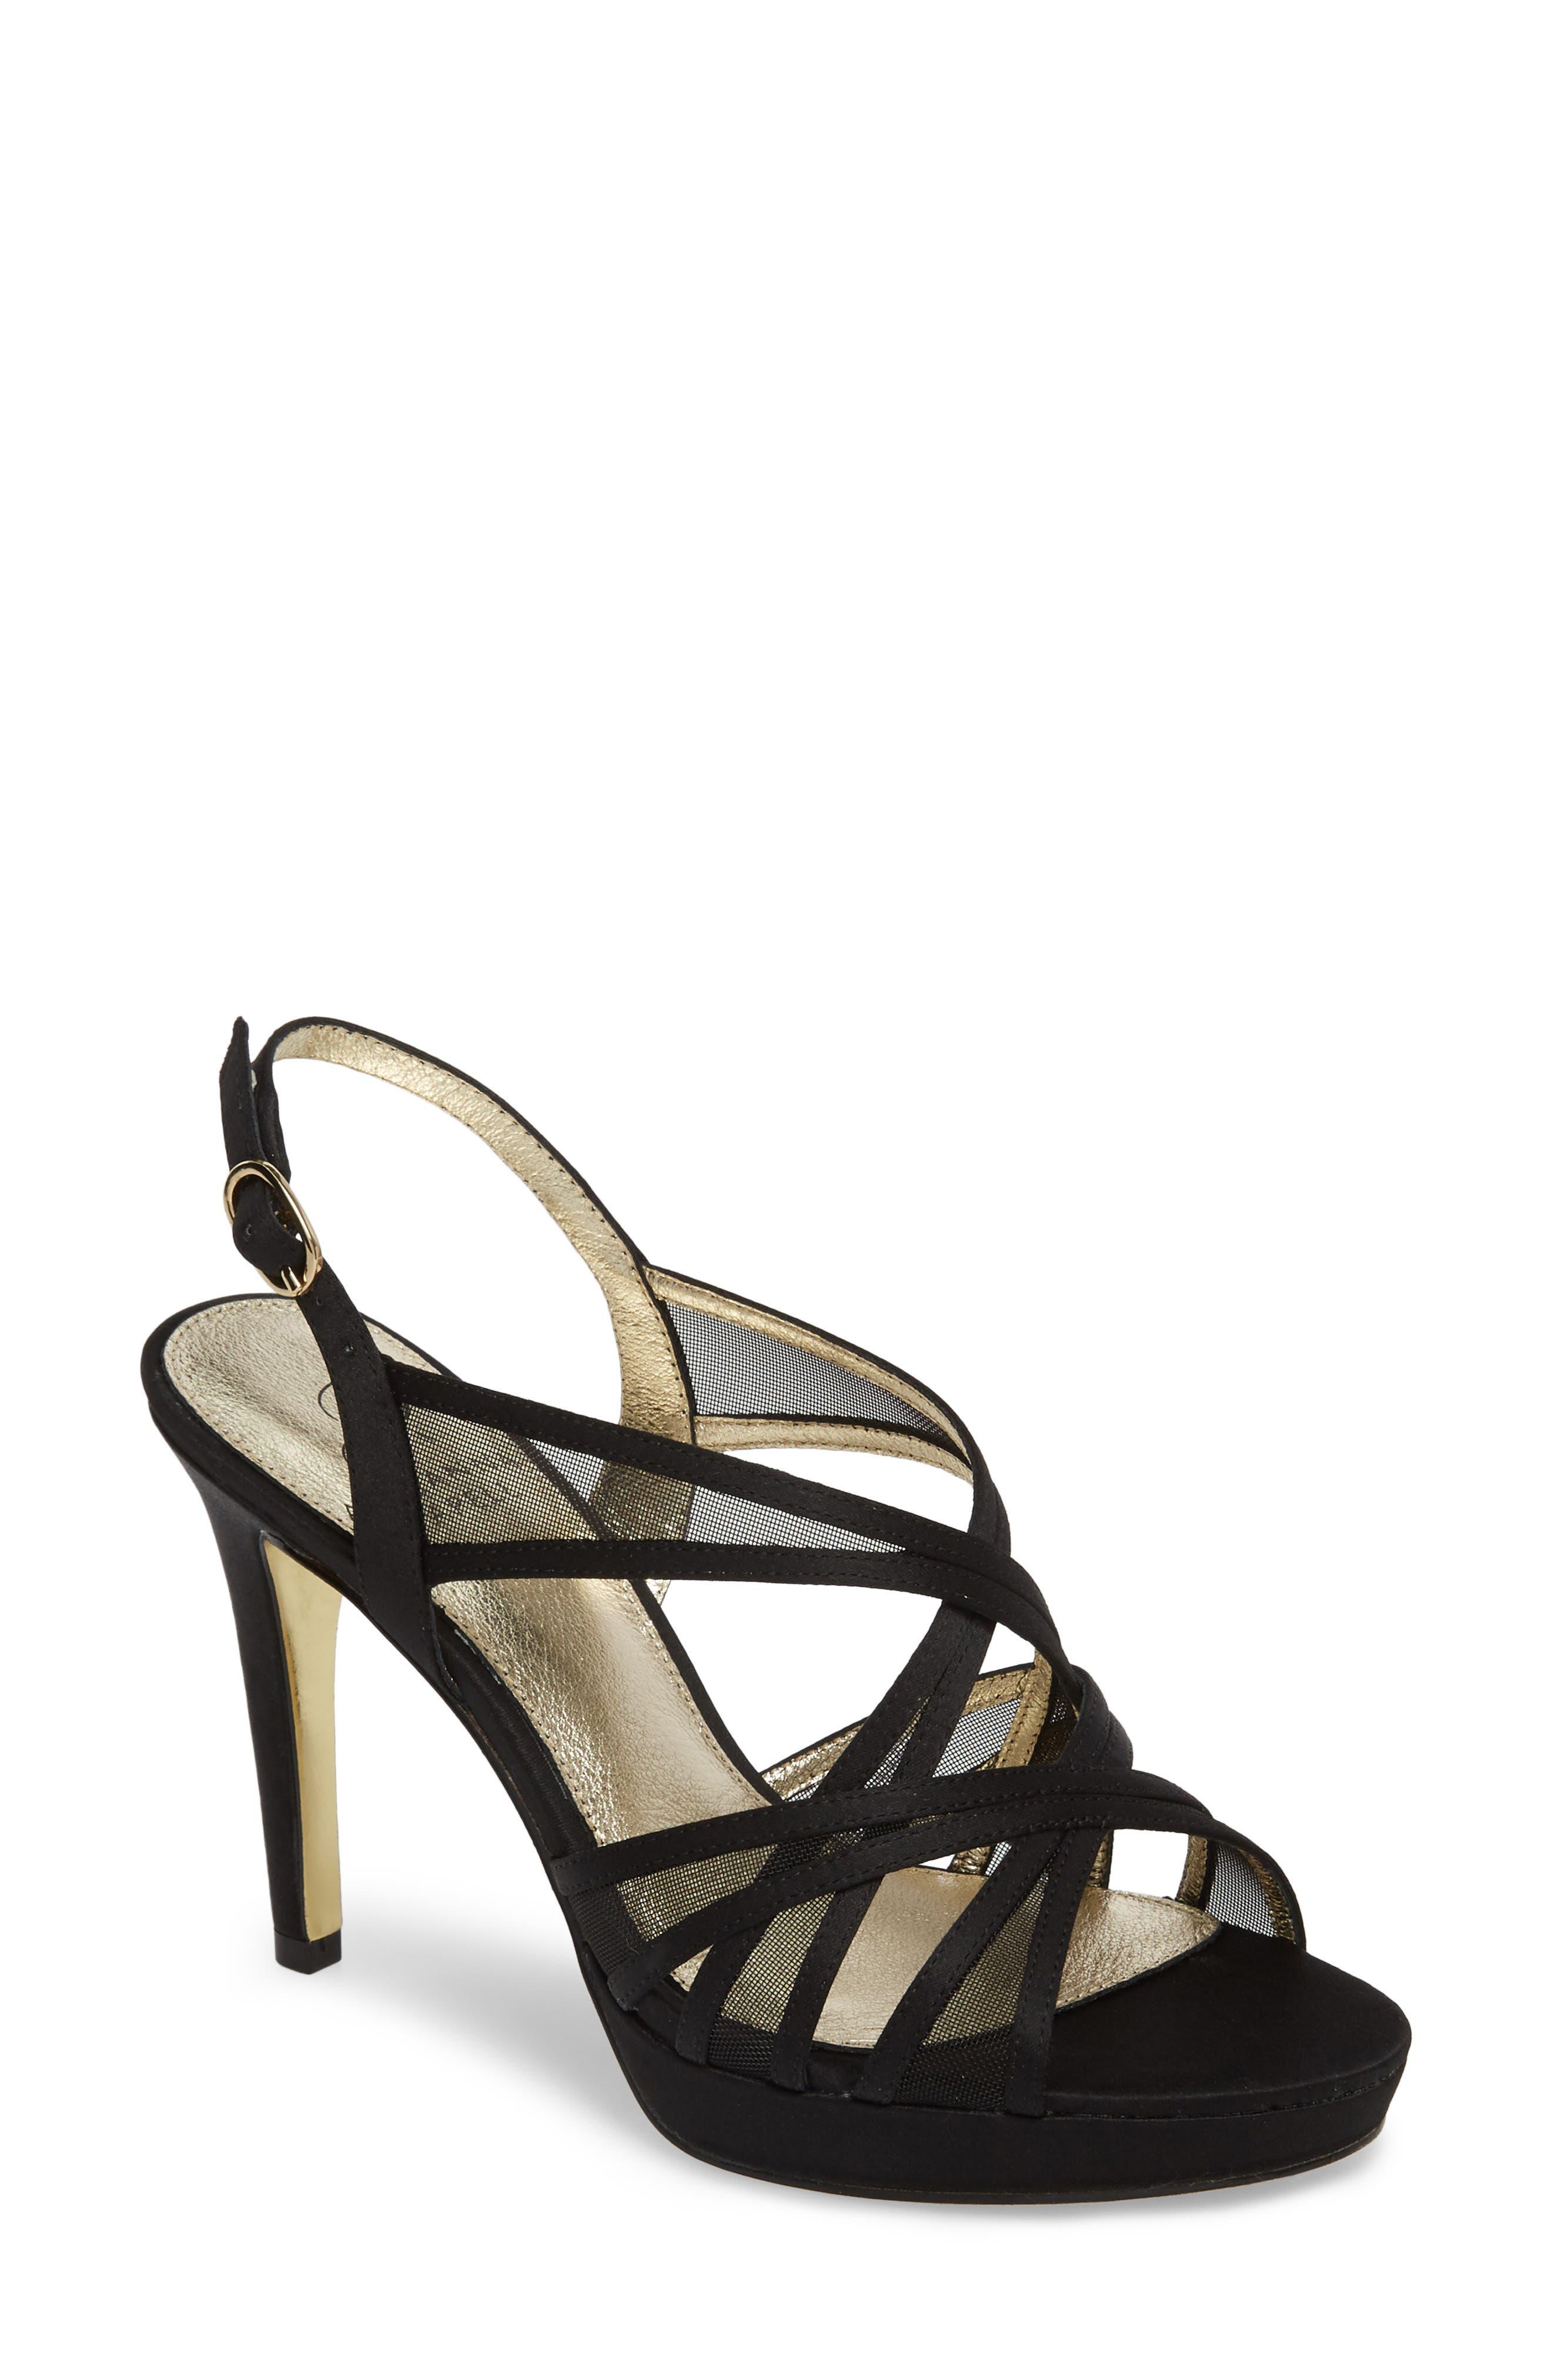 Adrianna Papell Adri Platform Sandal, Black